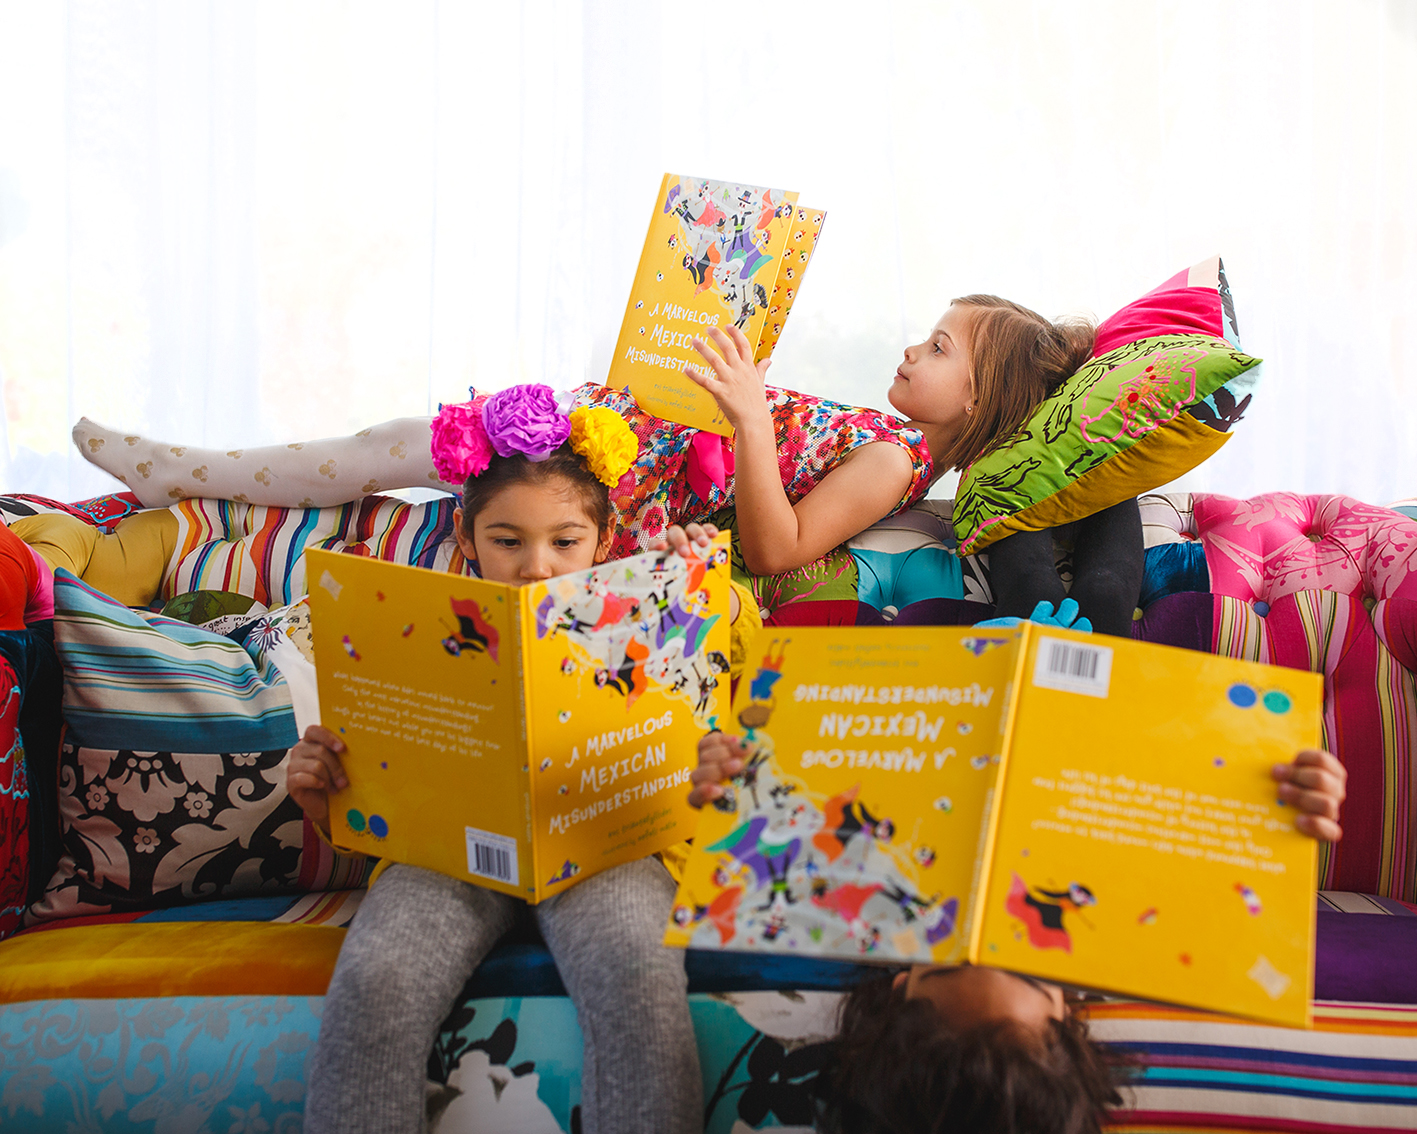 worldwide_buddies_picture_book_mexico_reading_fun.jpg